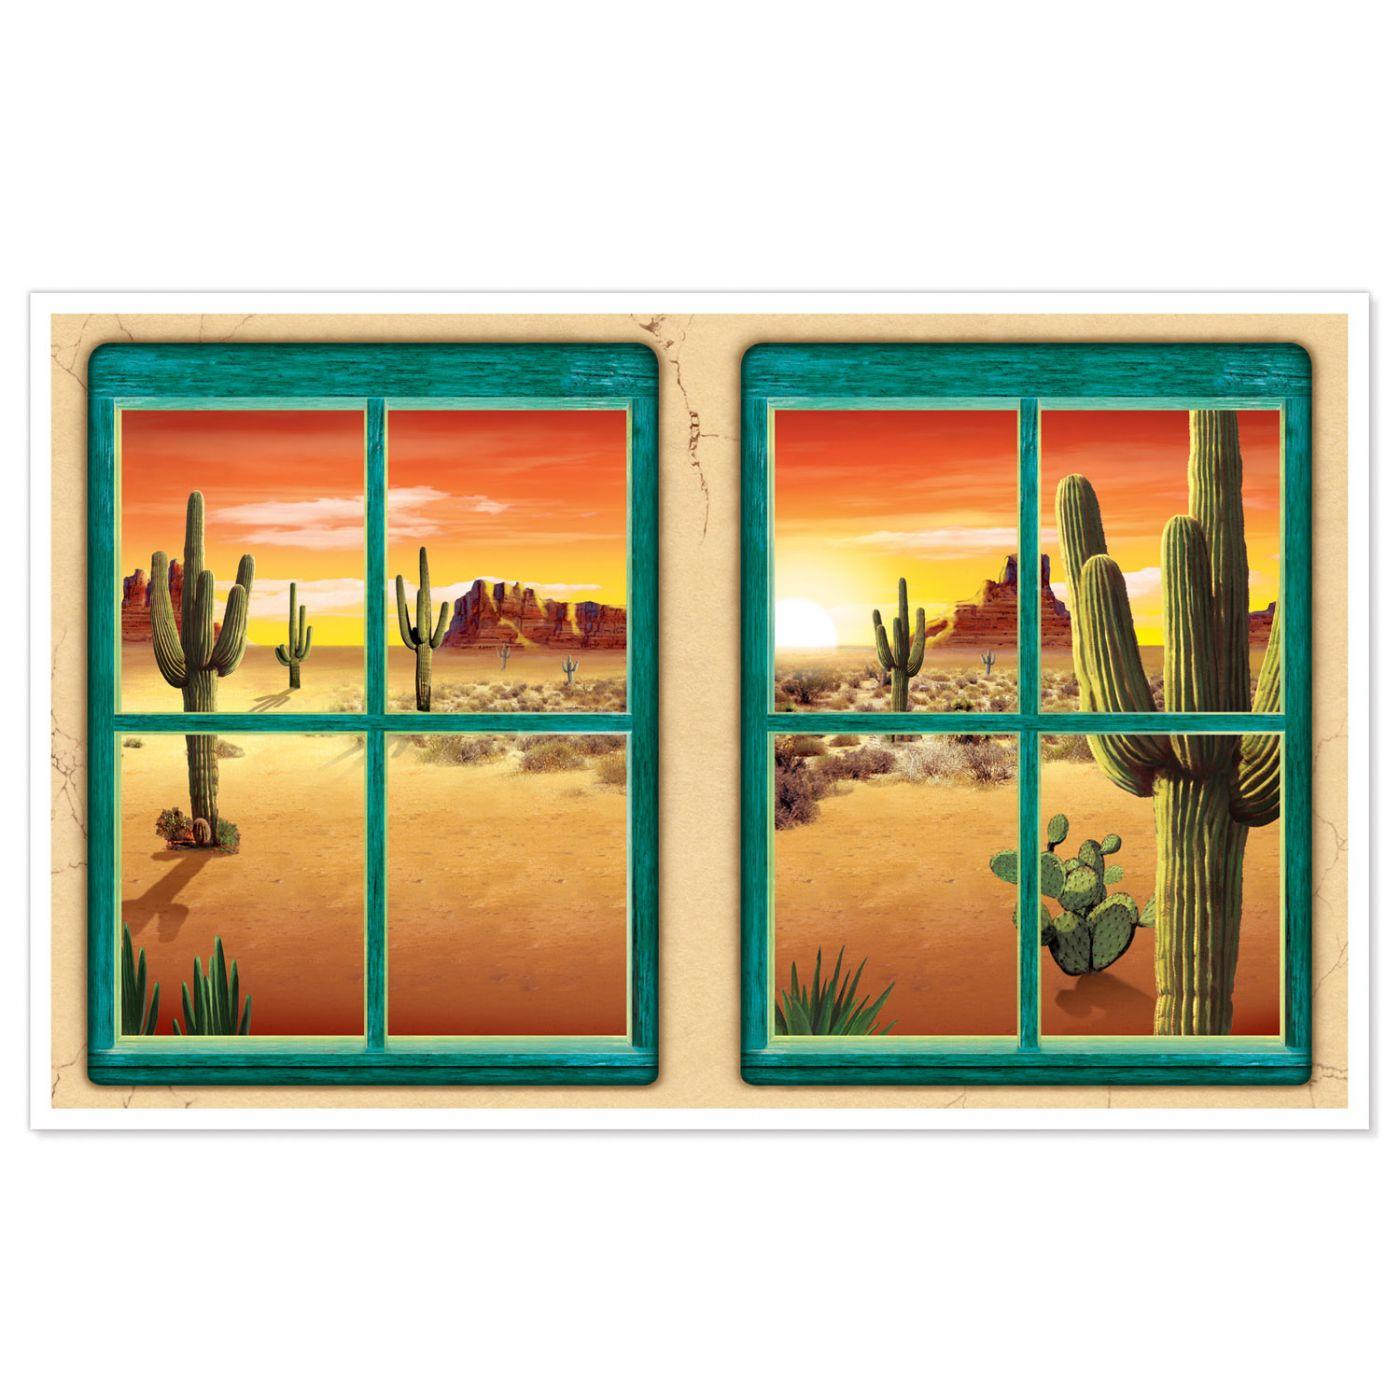 Desert Insta-View (6) image